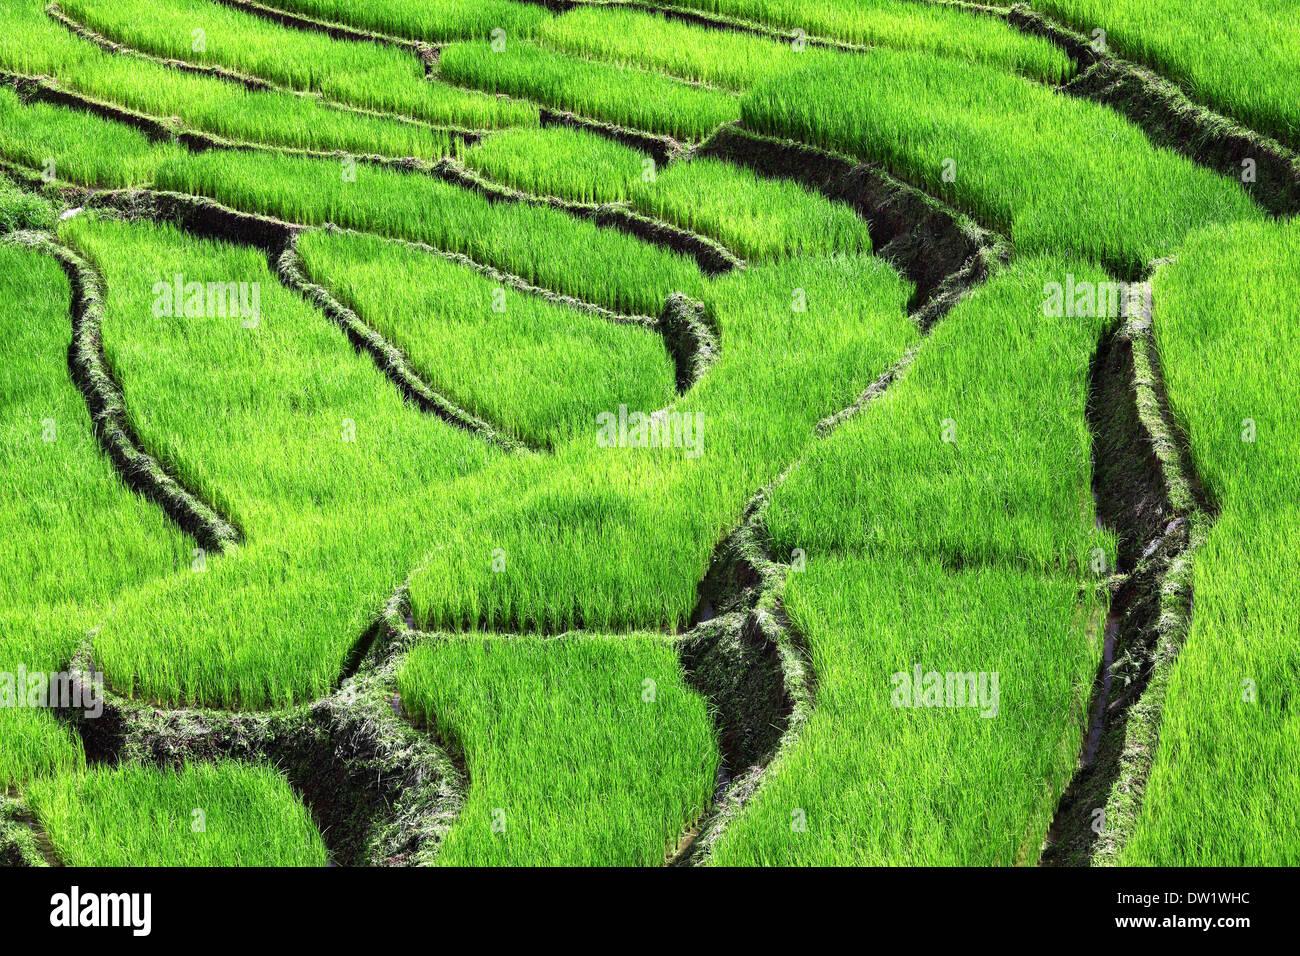 rice field - Stock Image